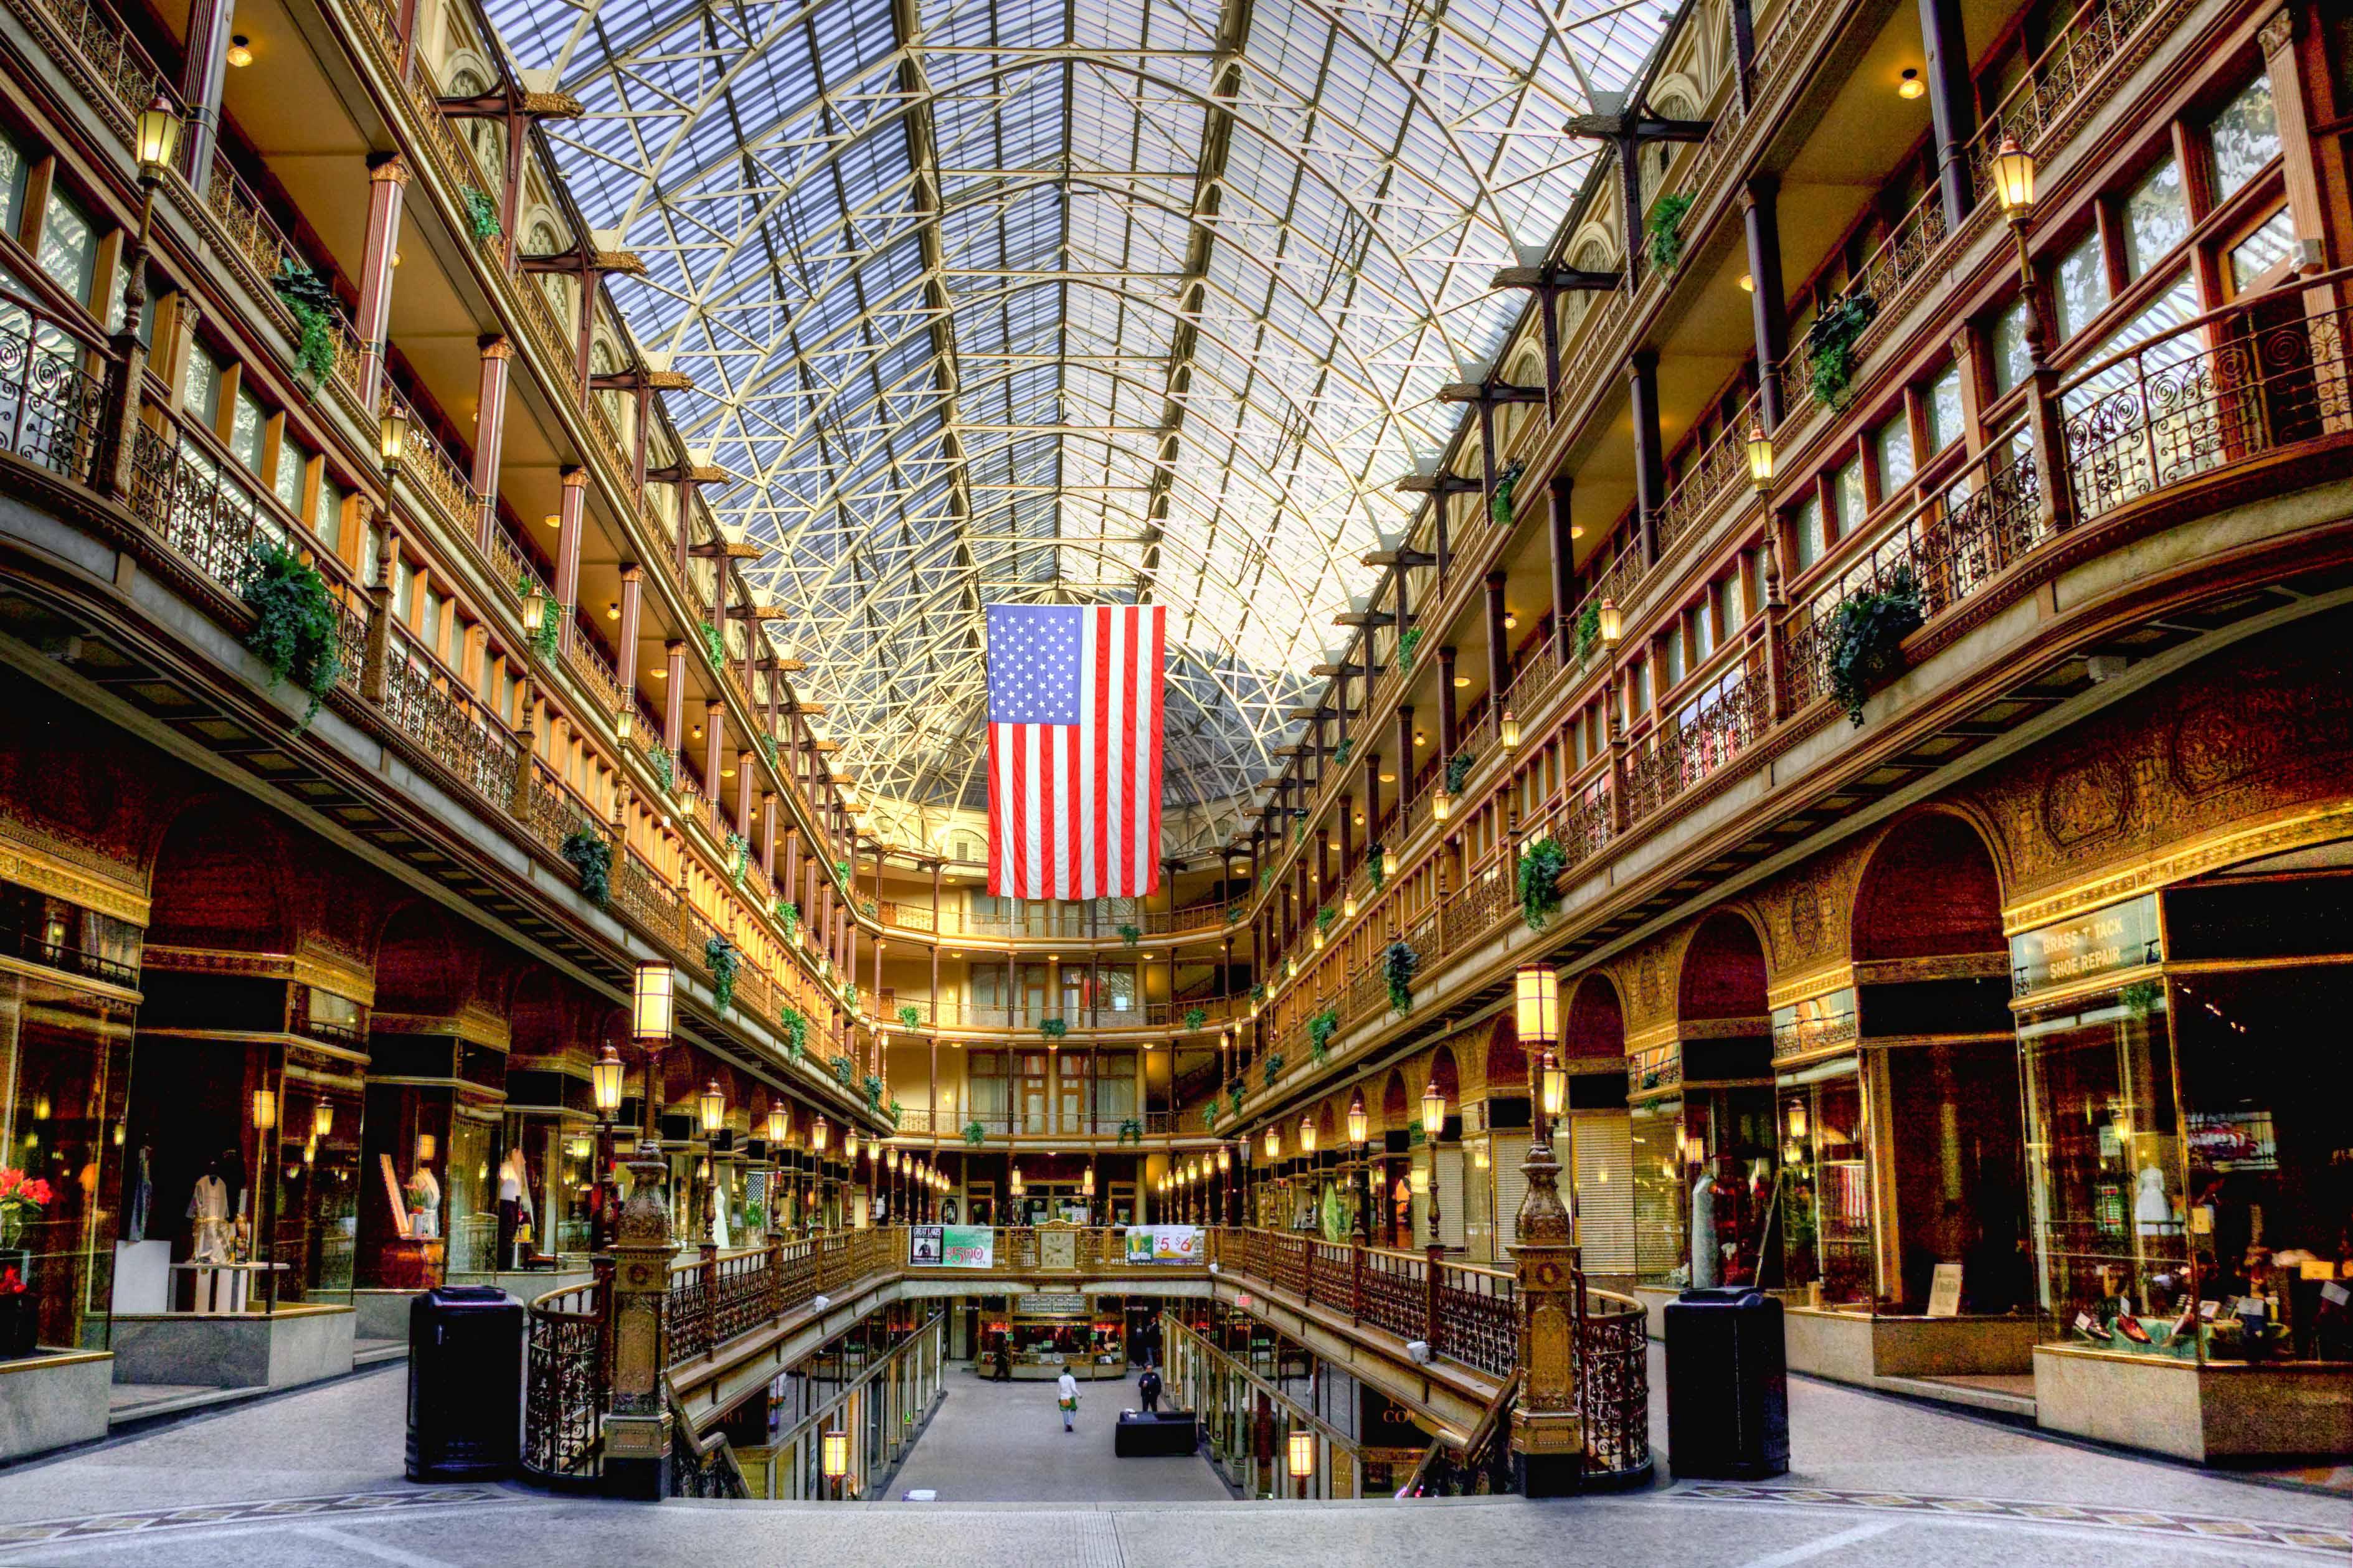 Arcade in Cleveland